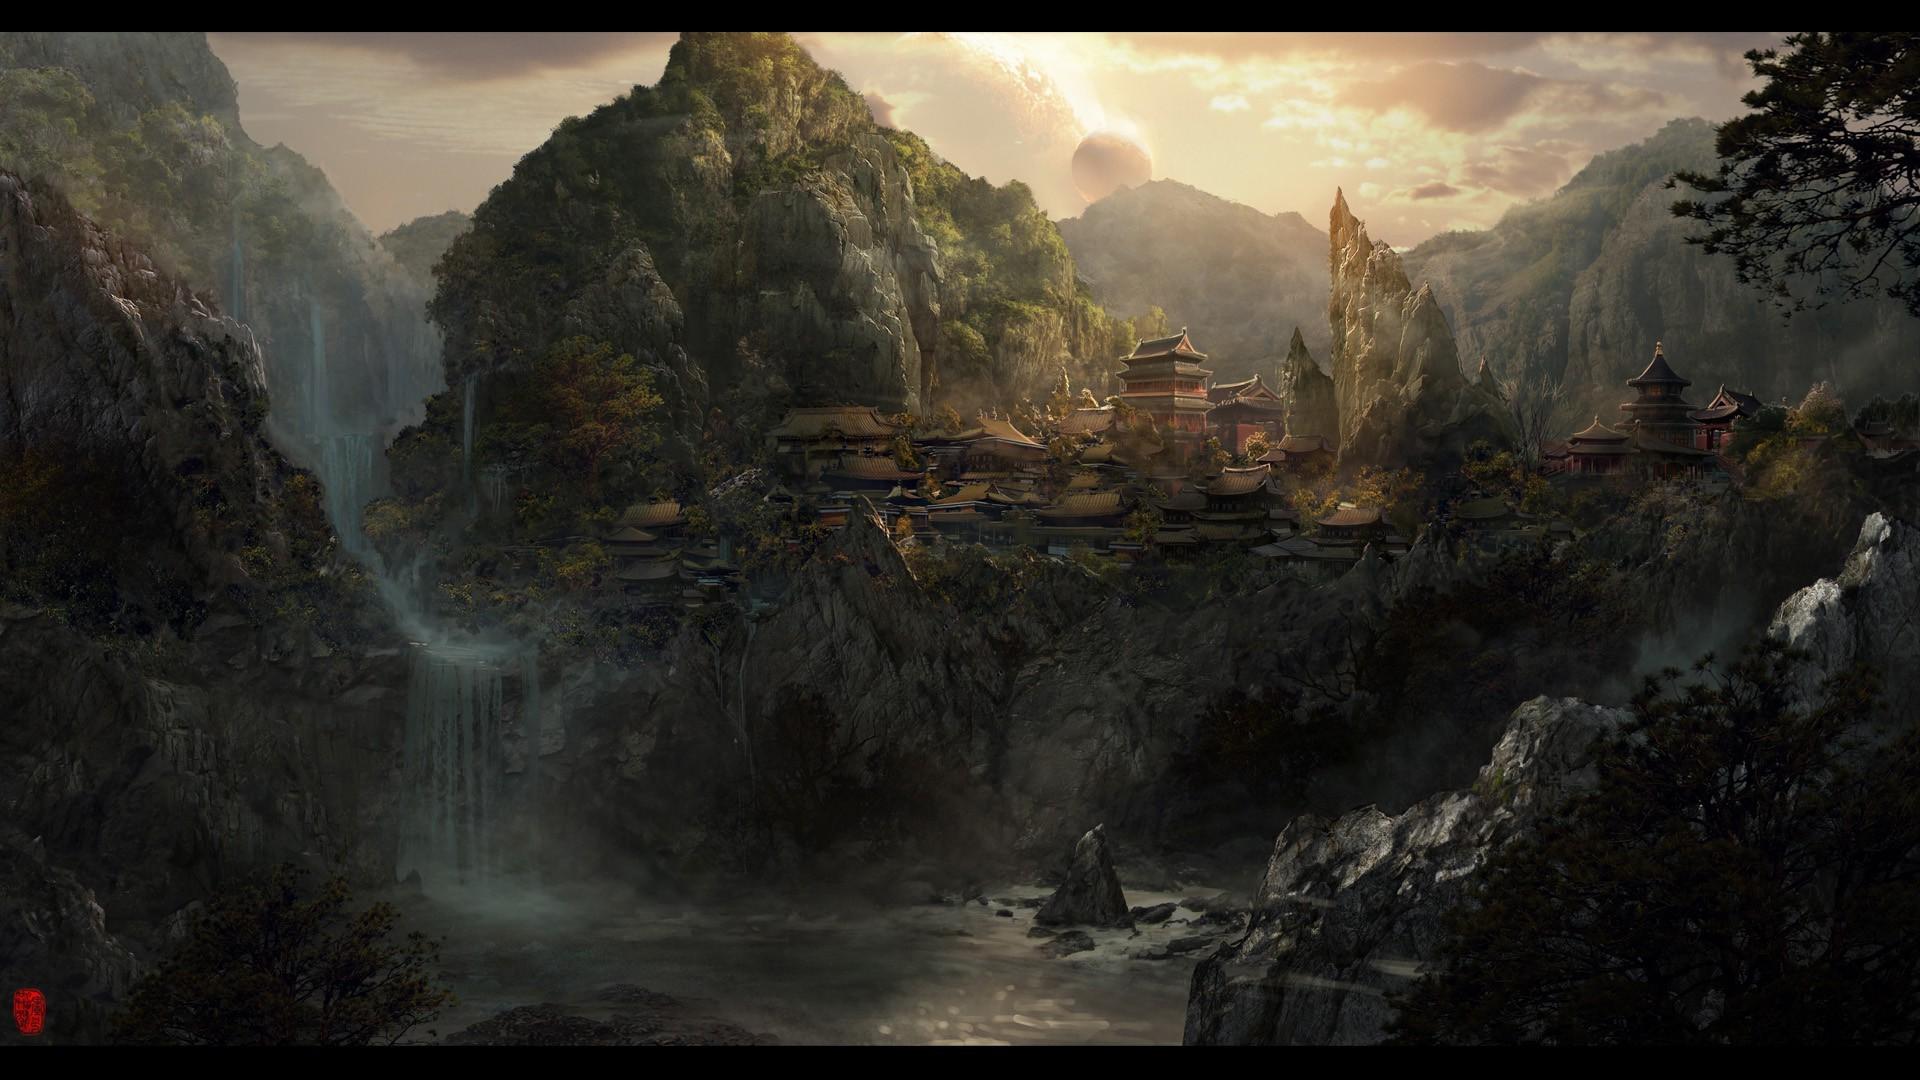 Beautiful Wallpaper Mountain Fantasy - 1920x1080-px-fantasy-art-Japan-mountain-waterfall-739906  Pic_45430.jpg